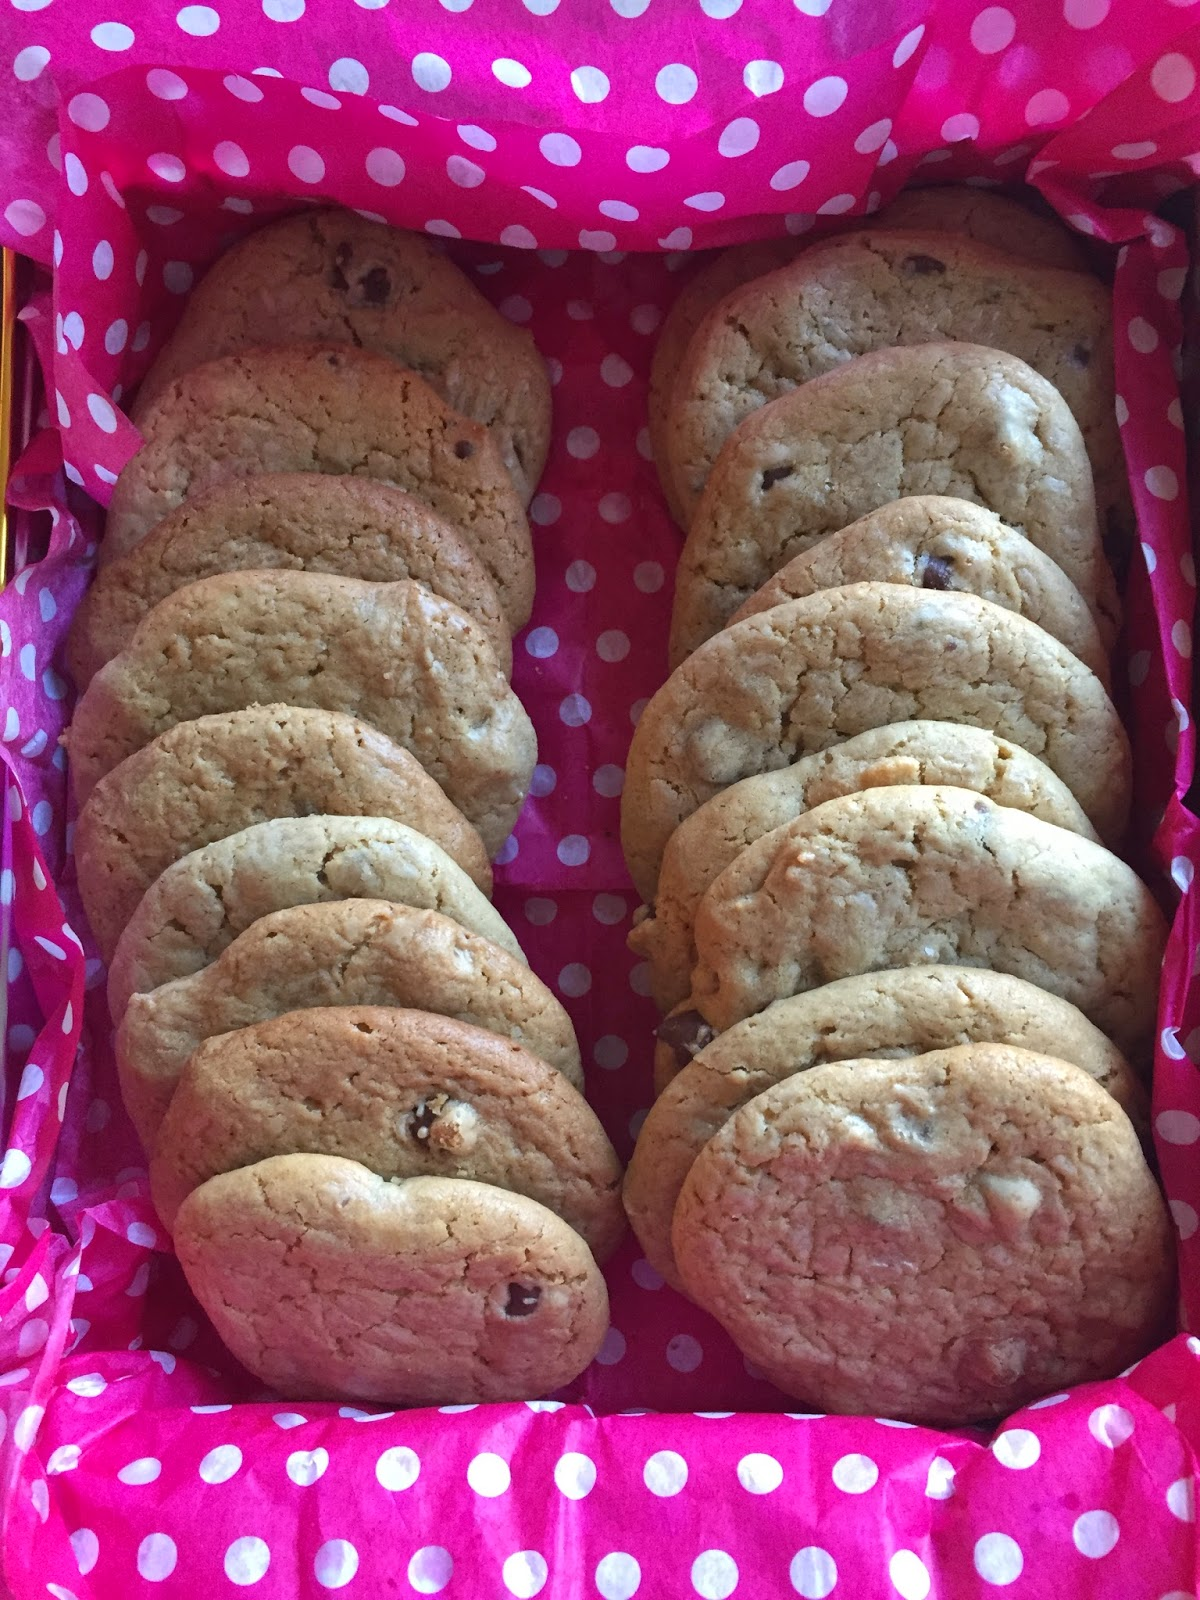 vegan chocolate chip cookie, vegan cookie, coconut oil, chickpea flour, eggless